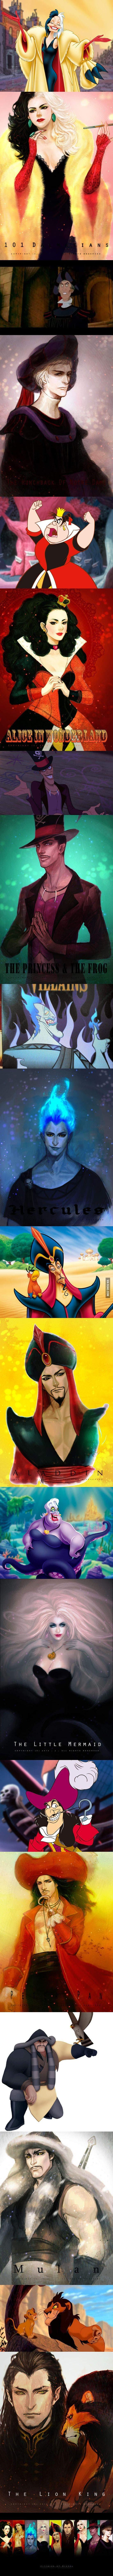 10 Disney Villains Become Beautiful